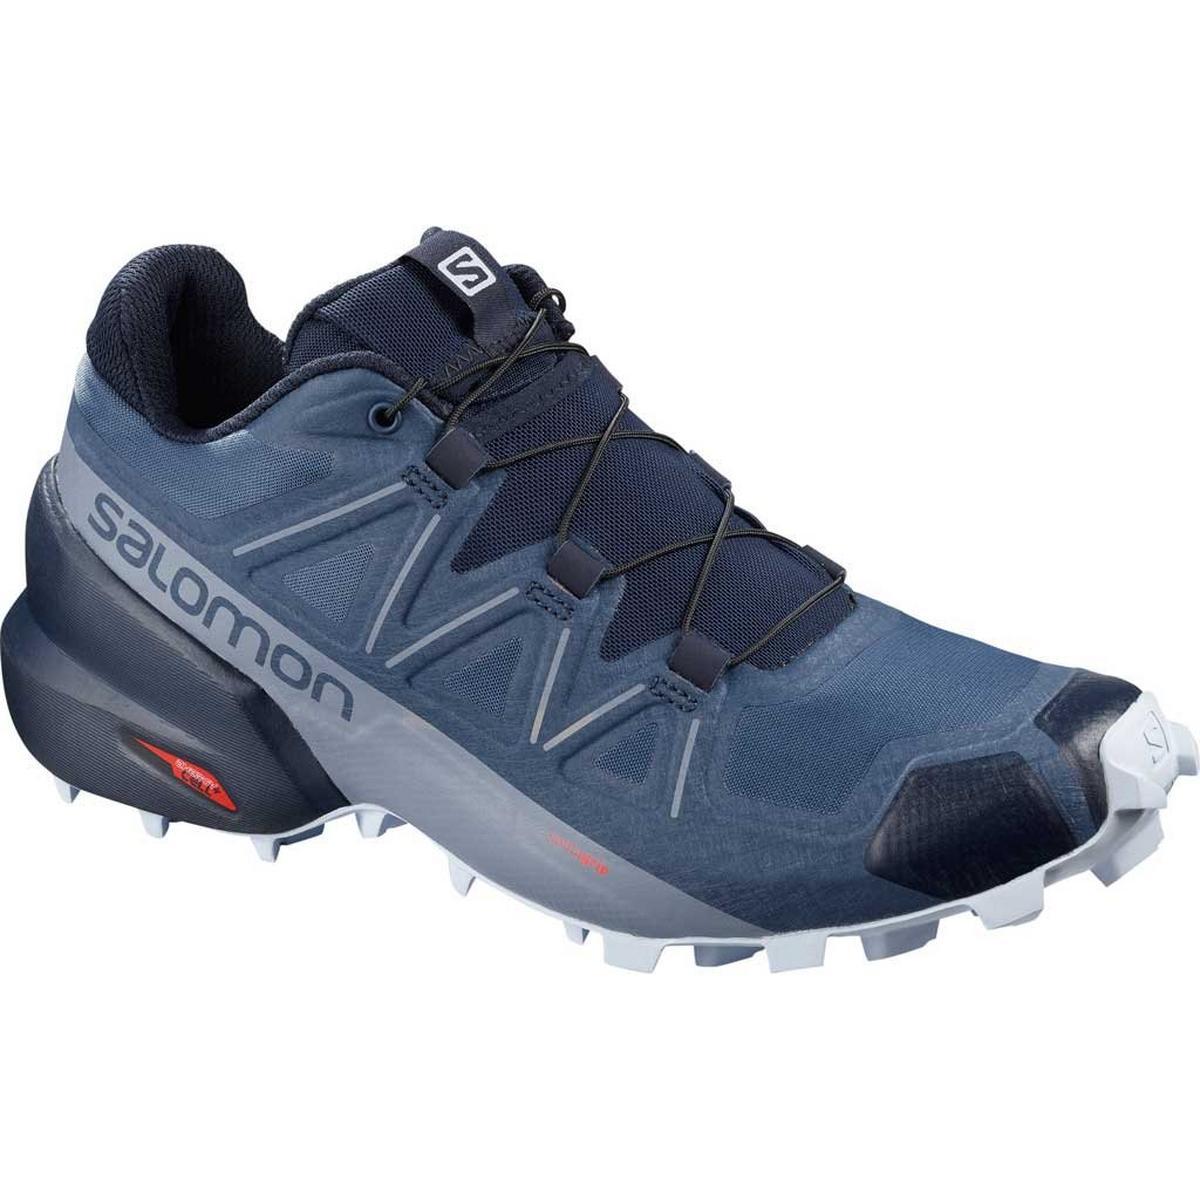 Salomon Shoes Women's Speedcross 5 Wide Sargasso Sea/Navy